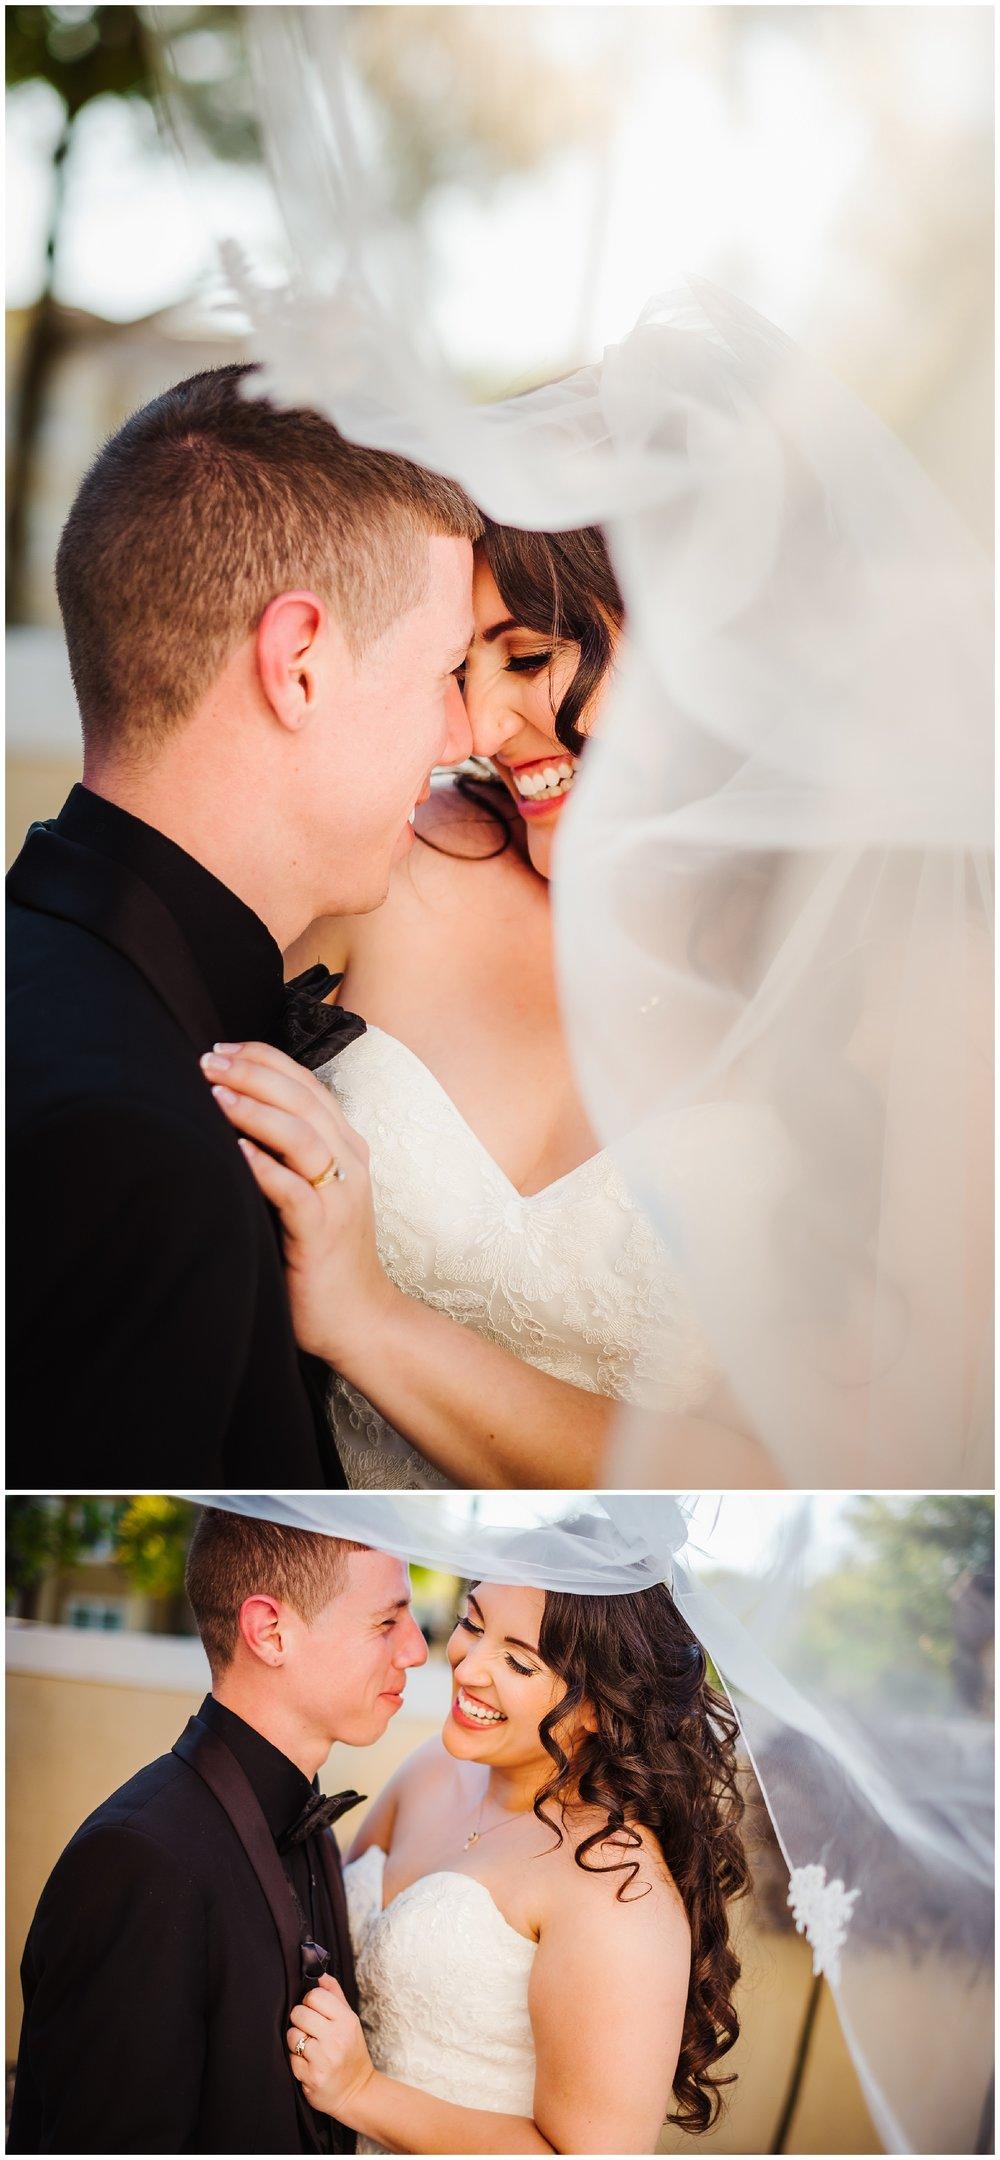 tampa-wedding-photographer-unique-indoor-venue_0040.jpg